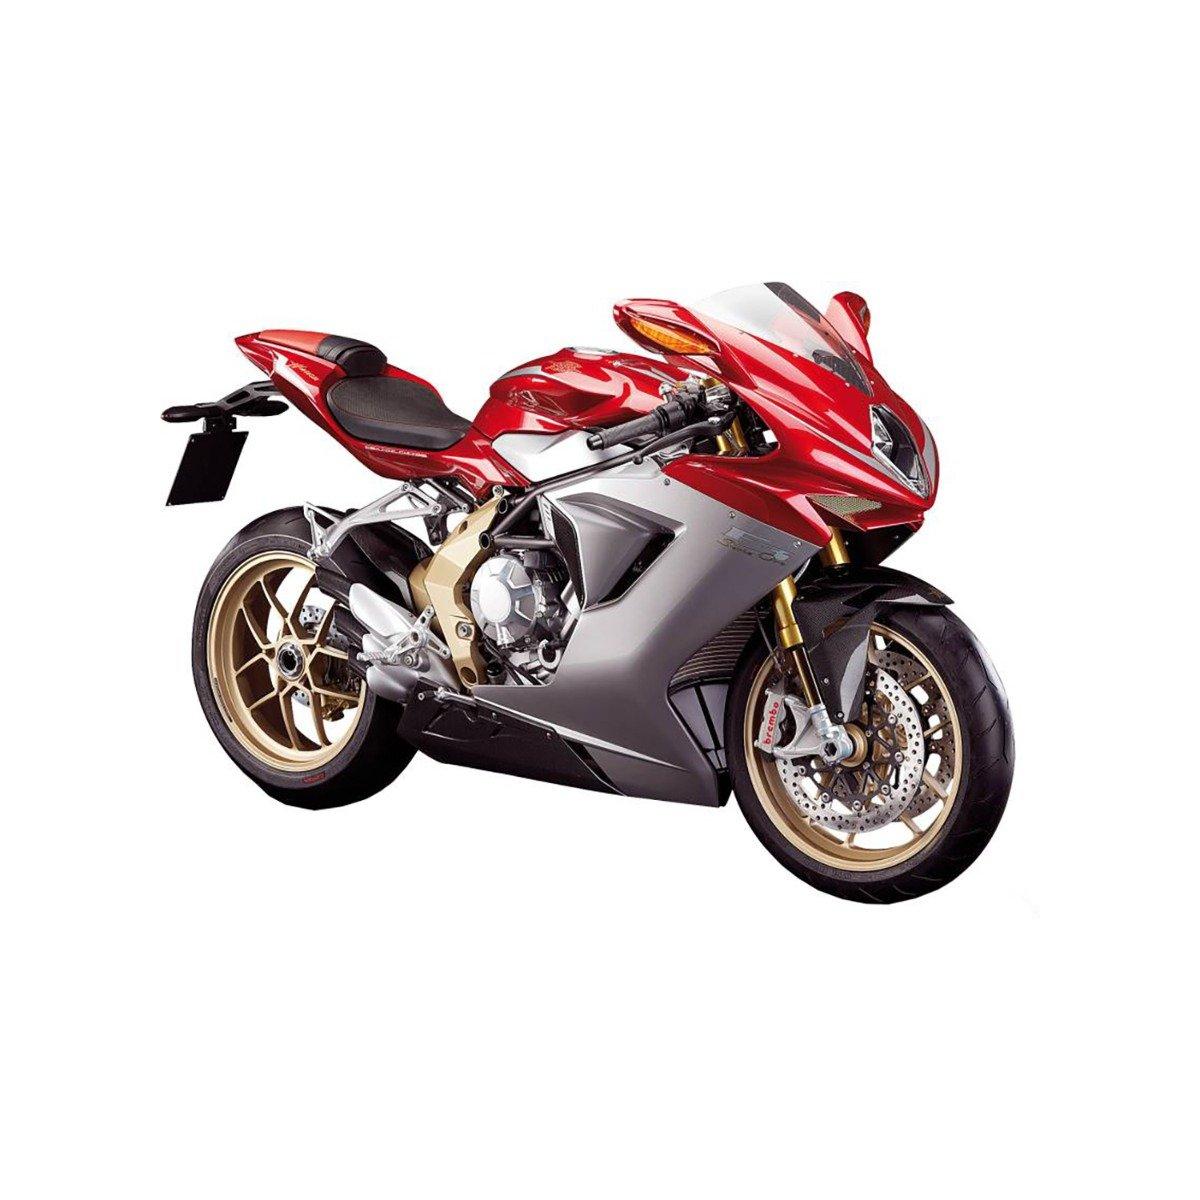 Motocicleta Maisto MV Agusta F3 Serie Oro 2012, 1:12